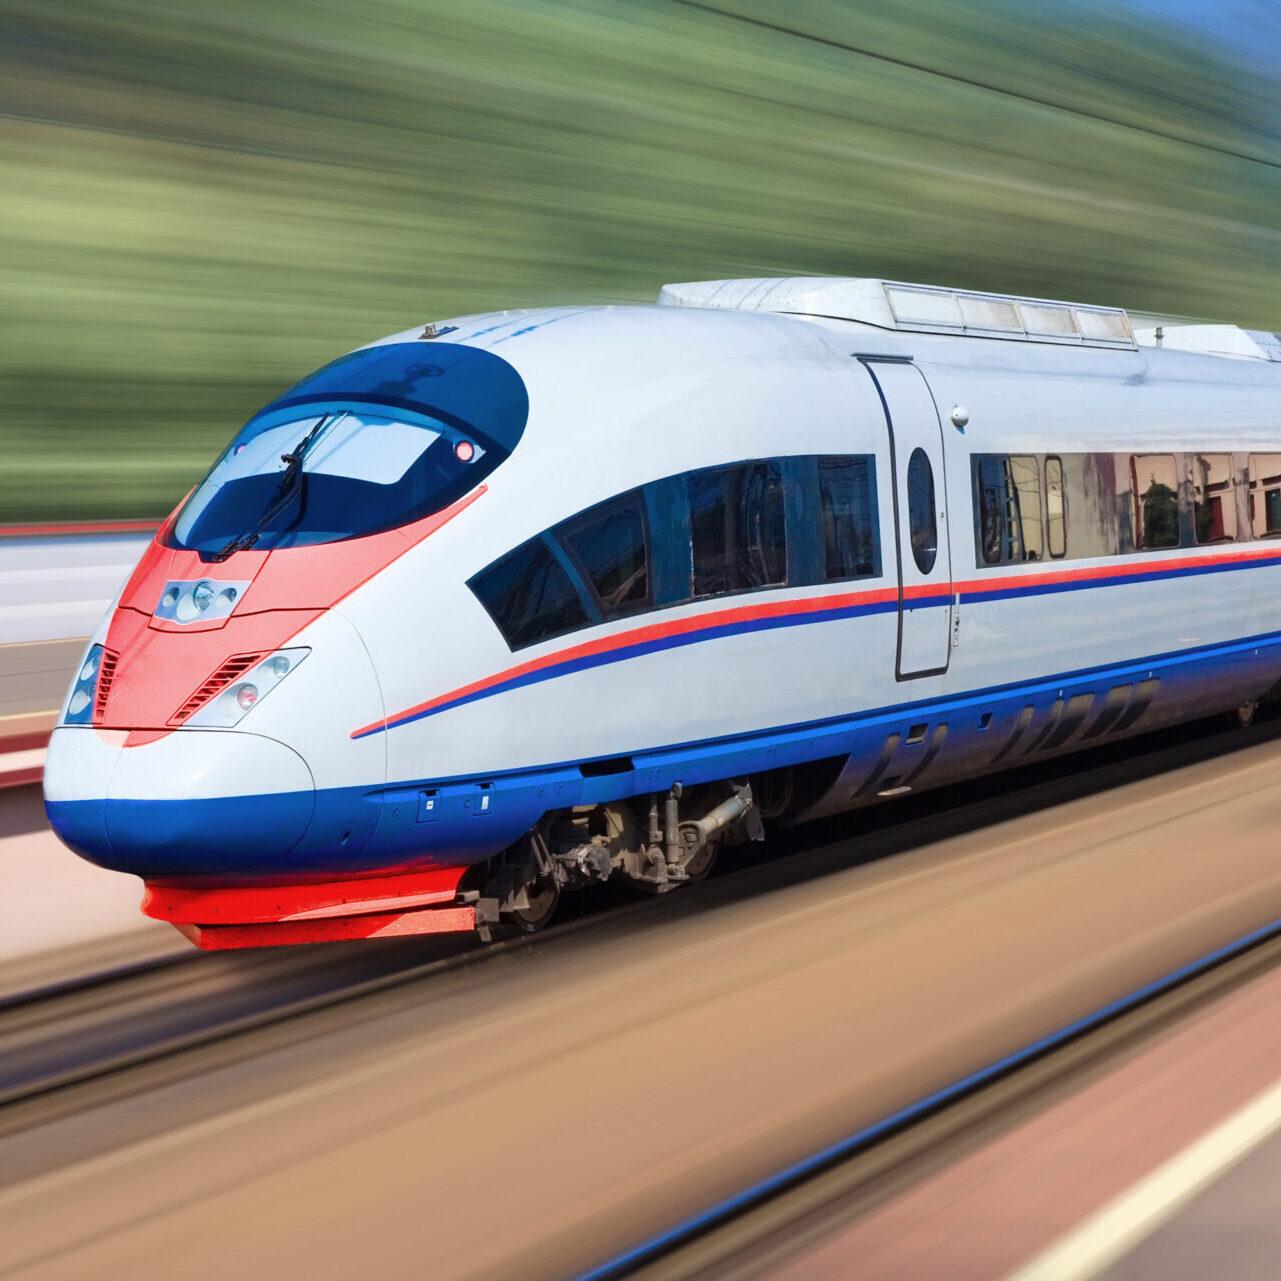 Werkzeugmaschinen für Railway &Metro / Machine tools for Railway & Metro / Станки для инструментов, Железная дорога и метро